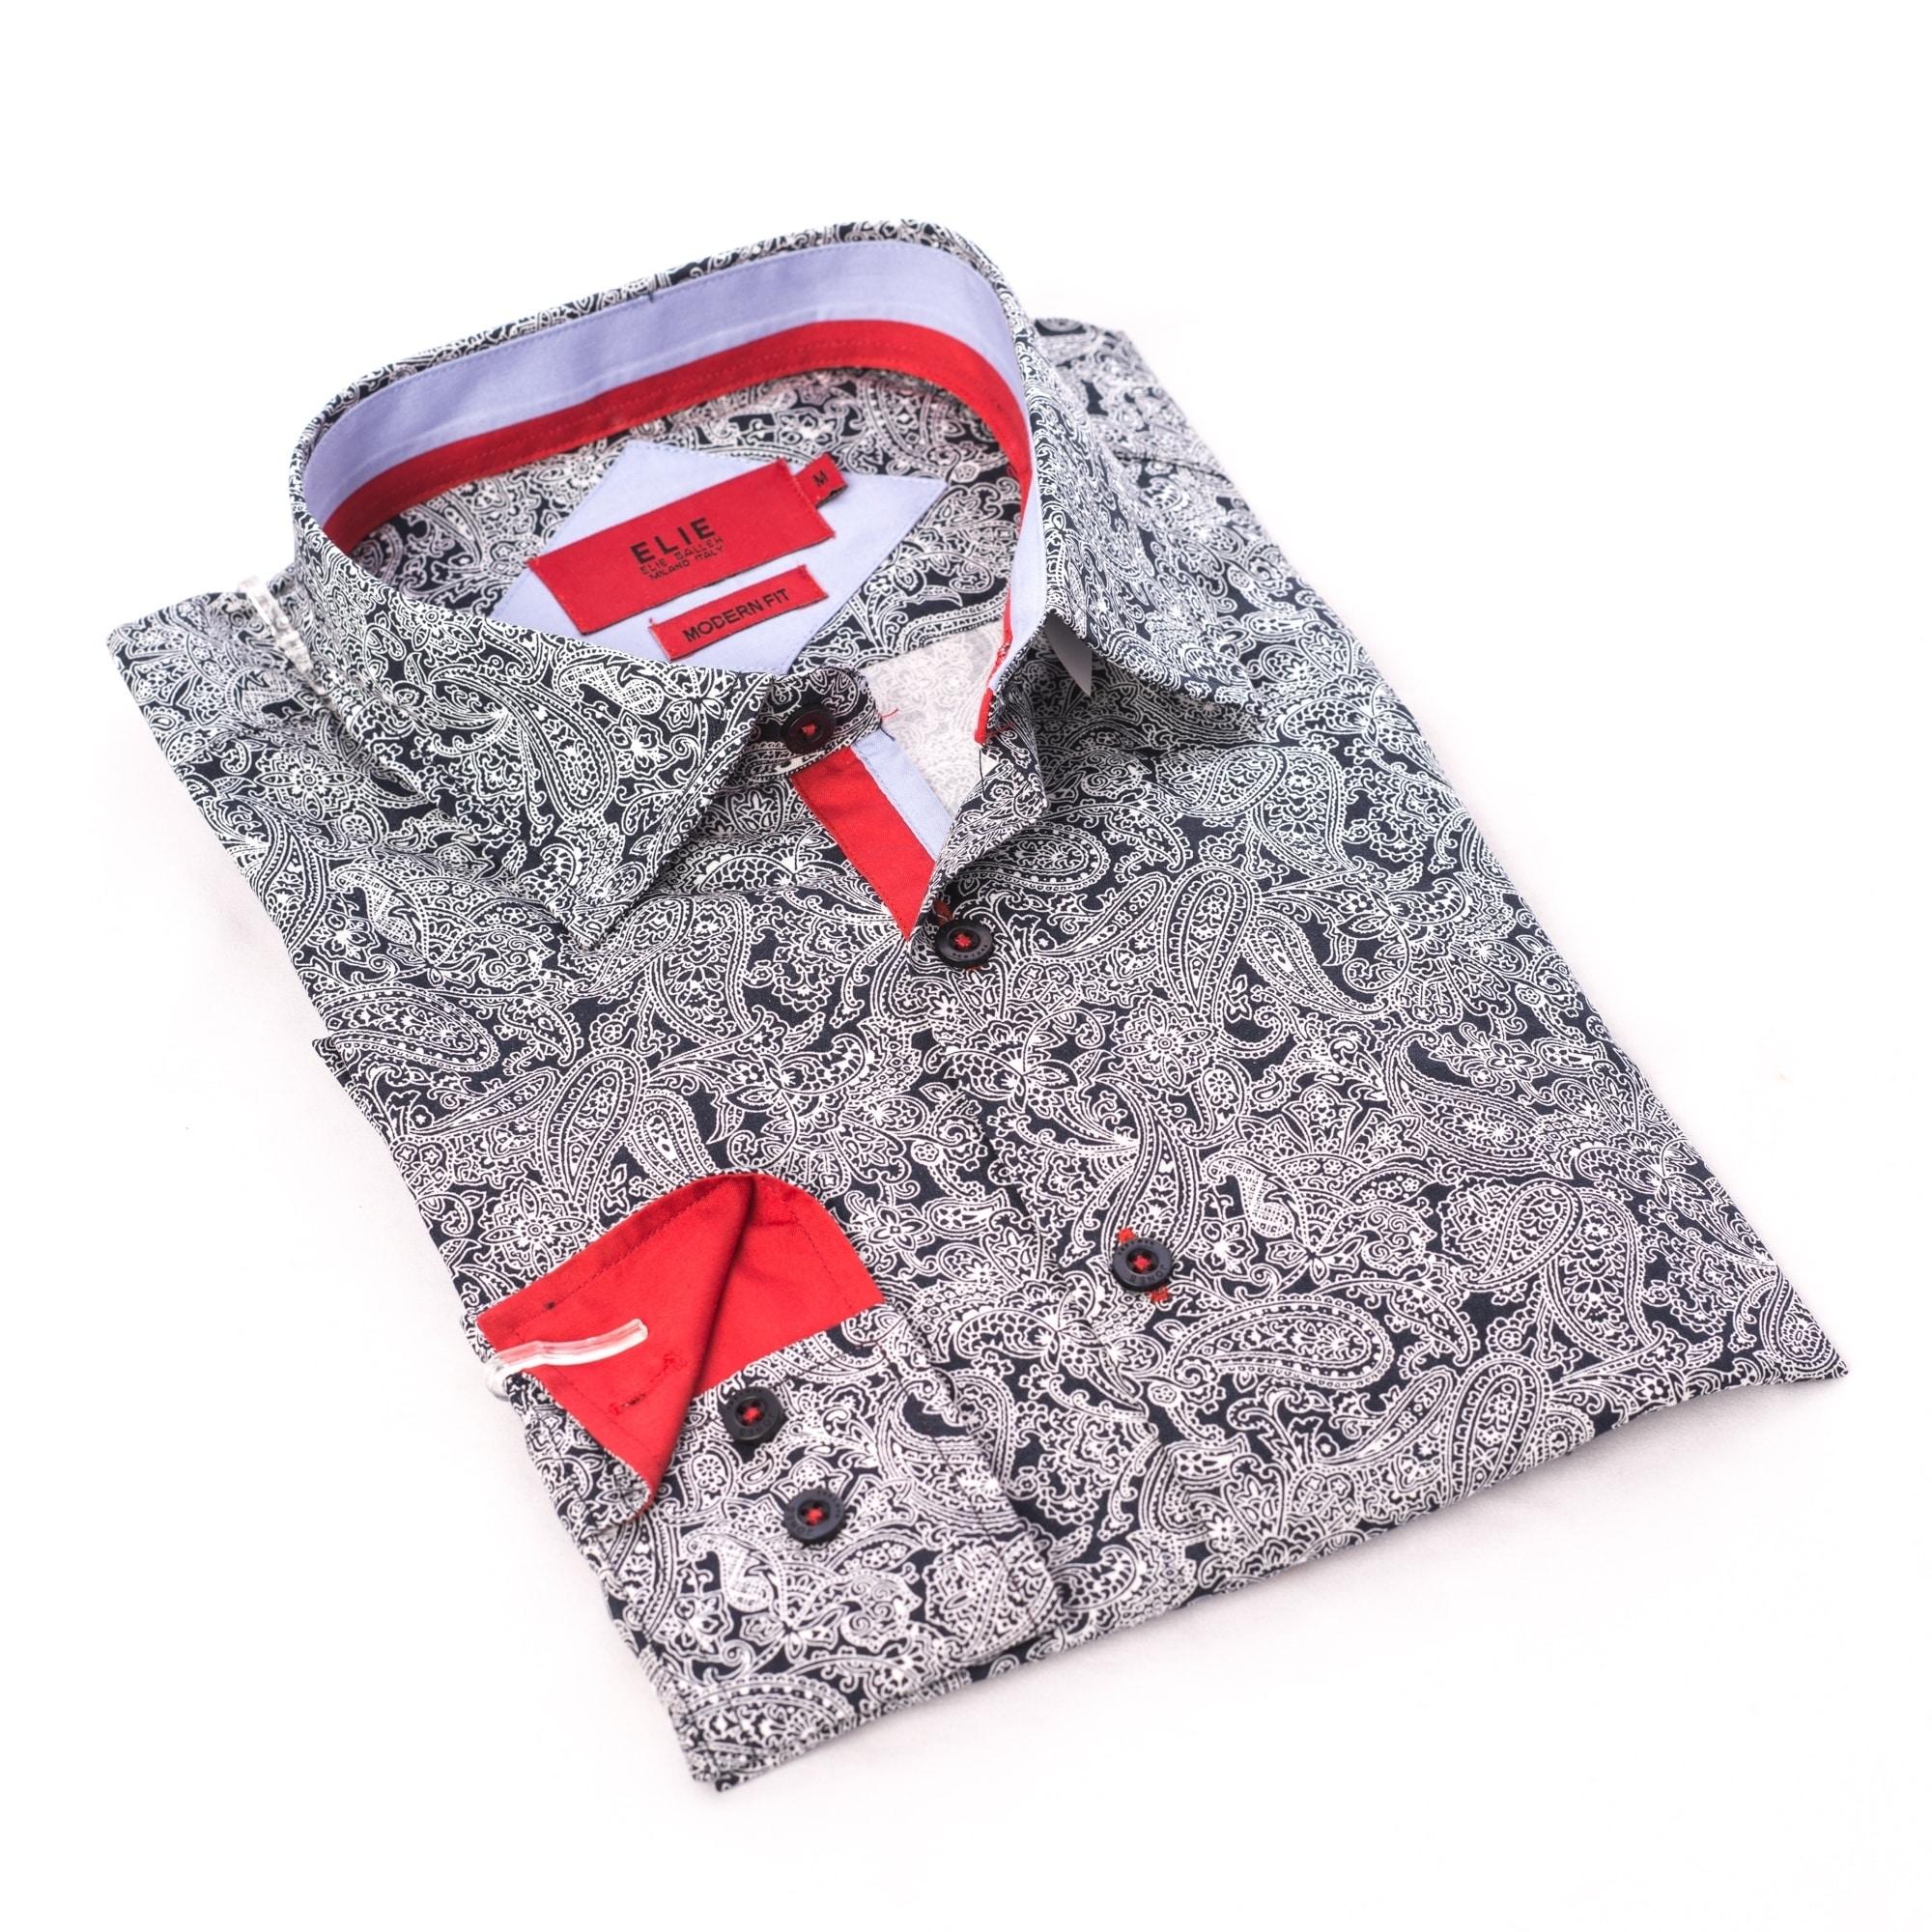 Toddler Boy Button Down Shirt Red